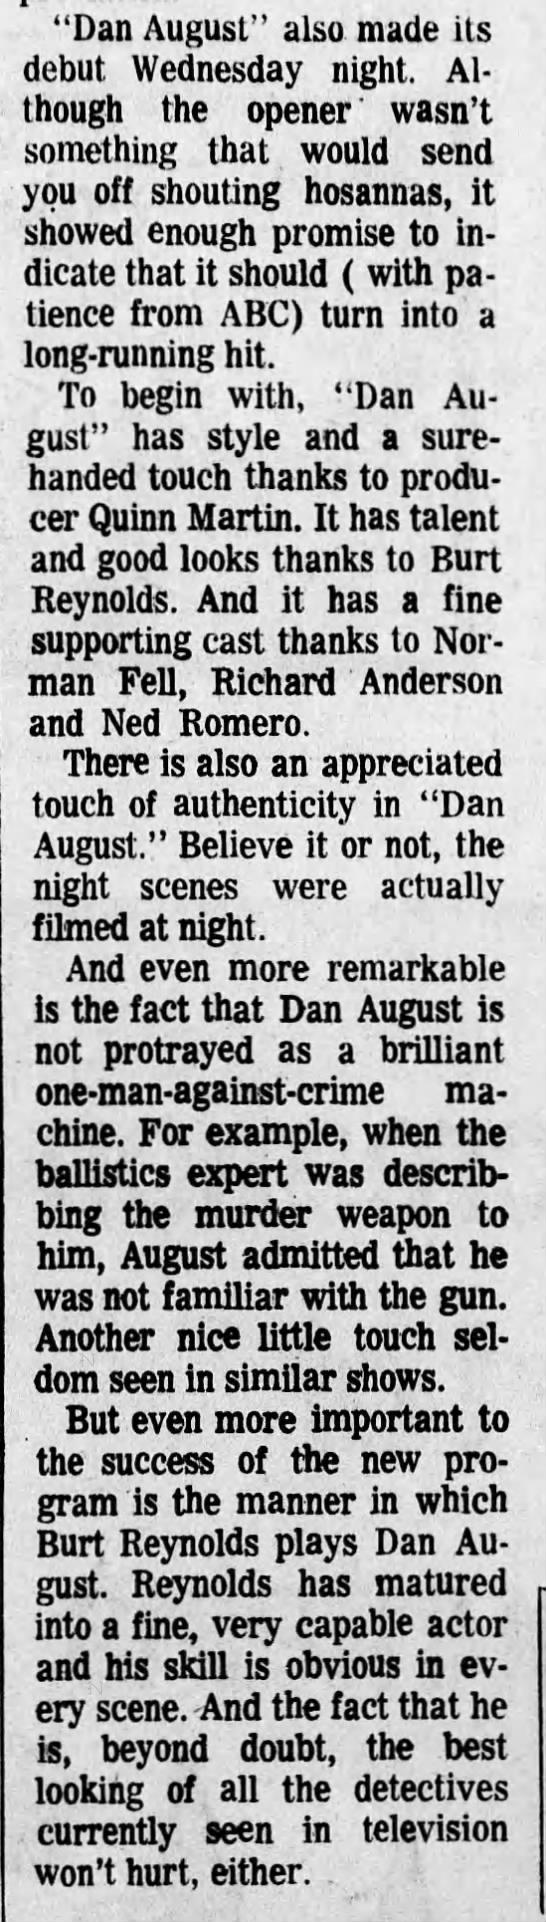 Dan August Arizona Daily Star 25 septembre 1970 -